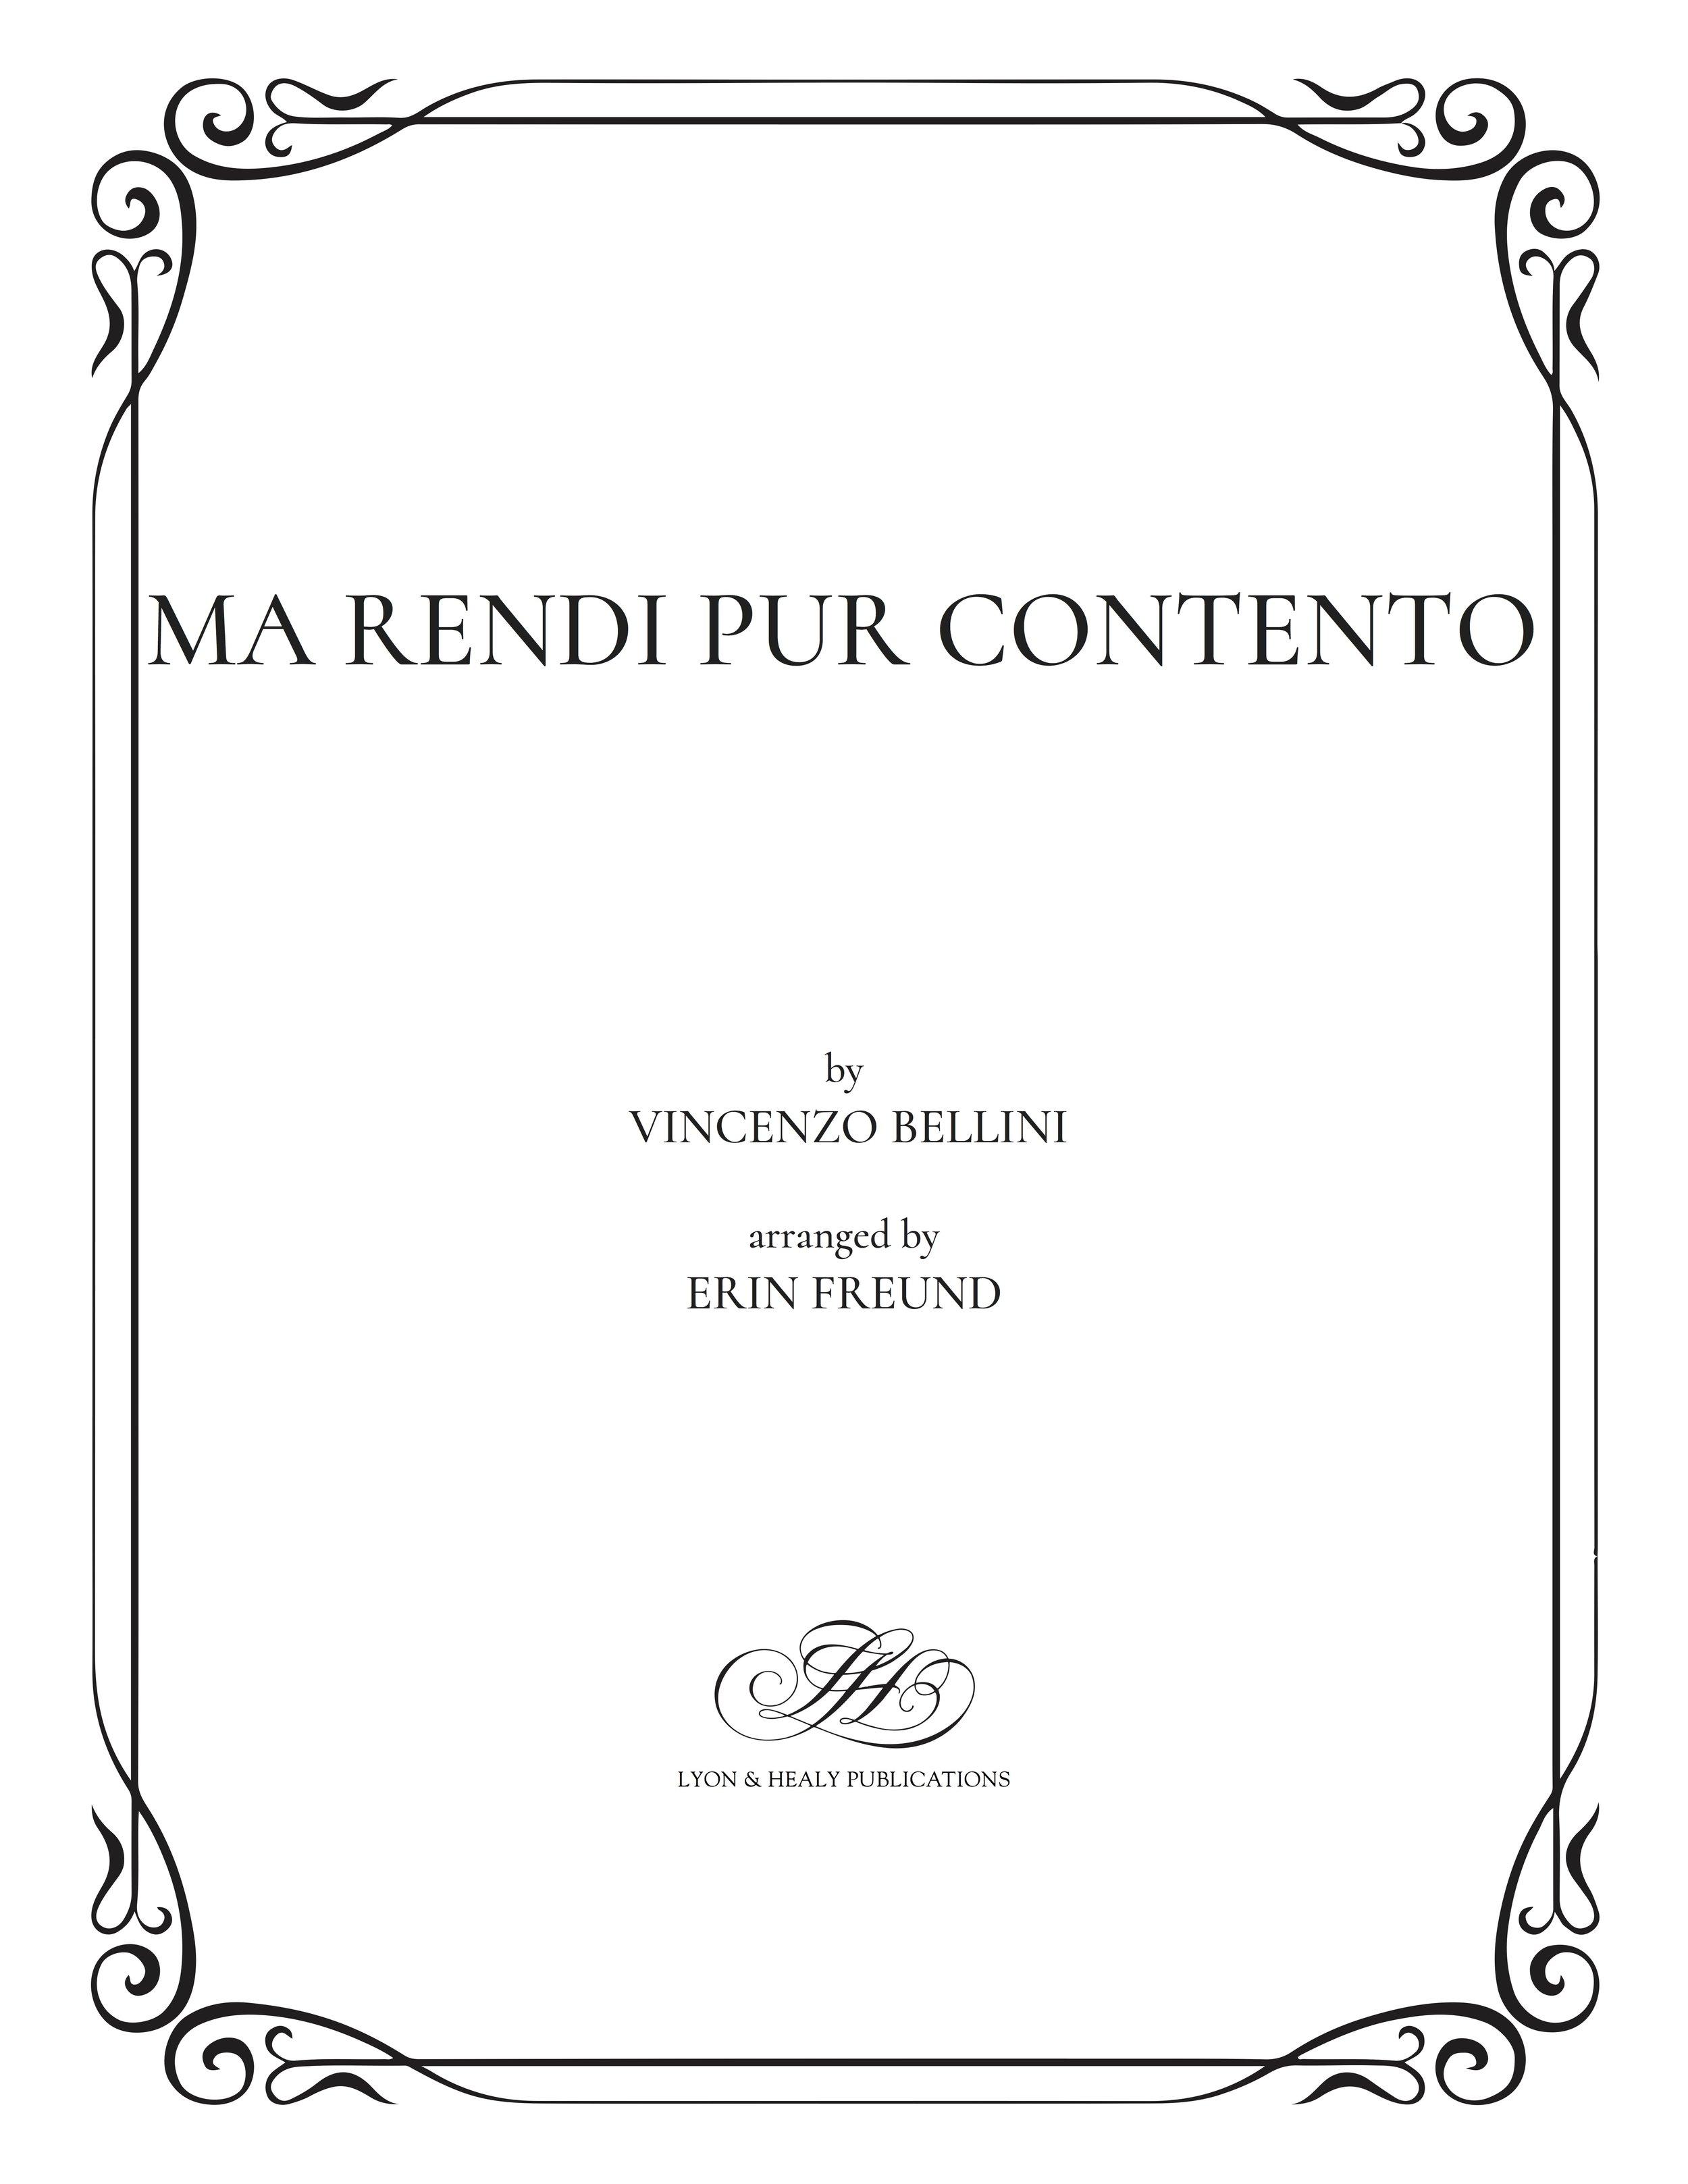 Ma rendi pur contento - Bellini-Freund cover.jpg